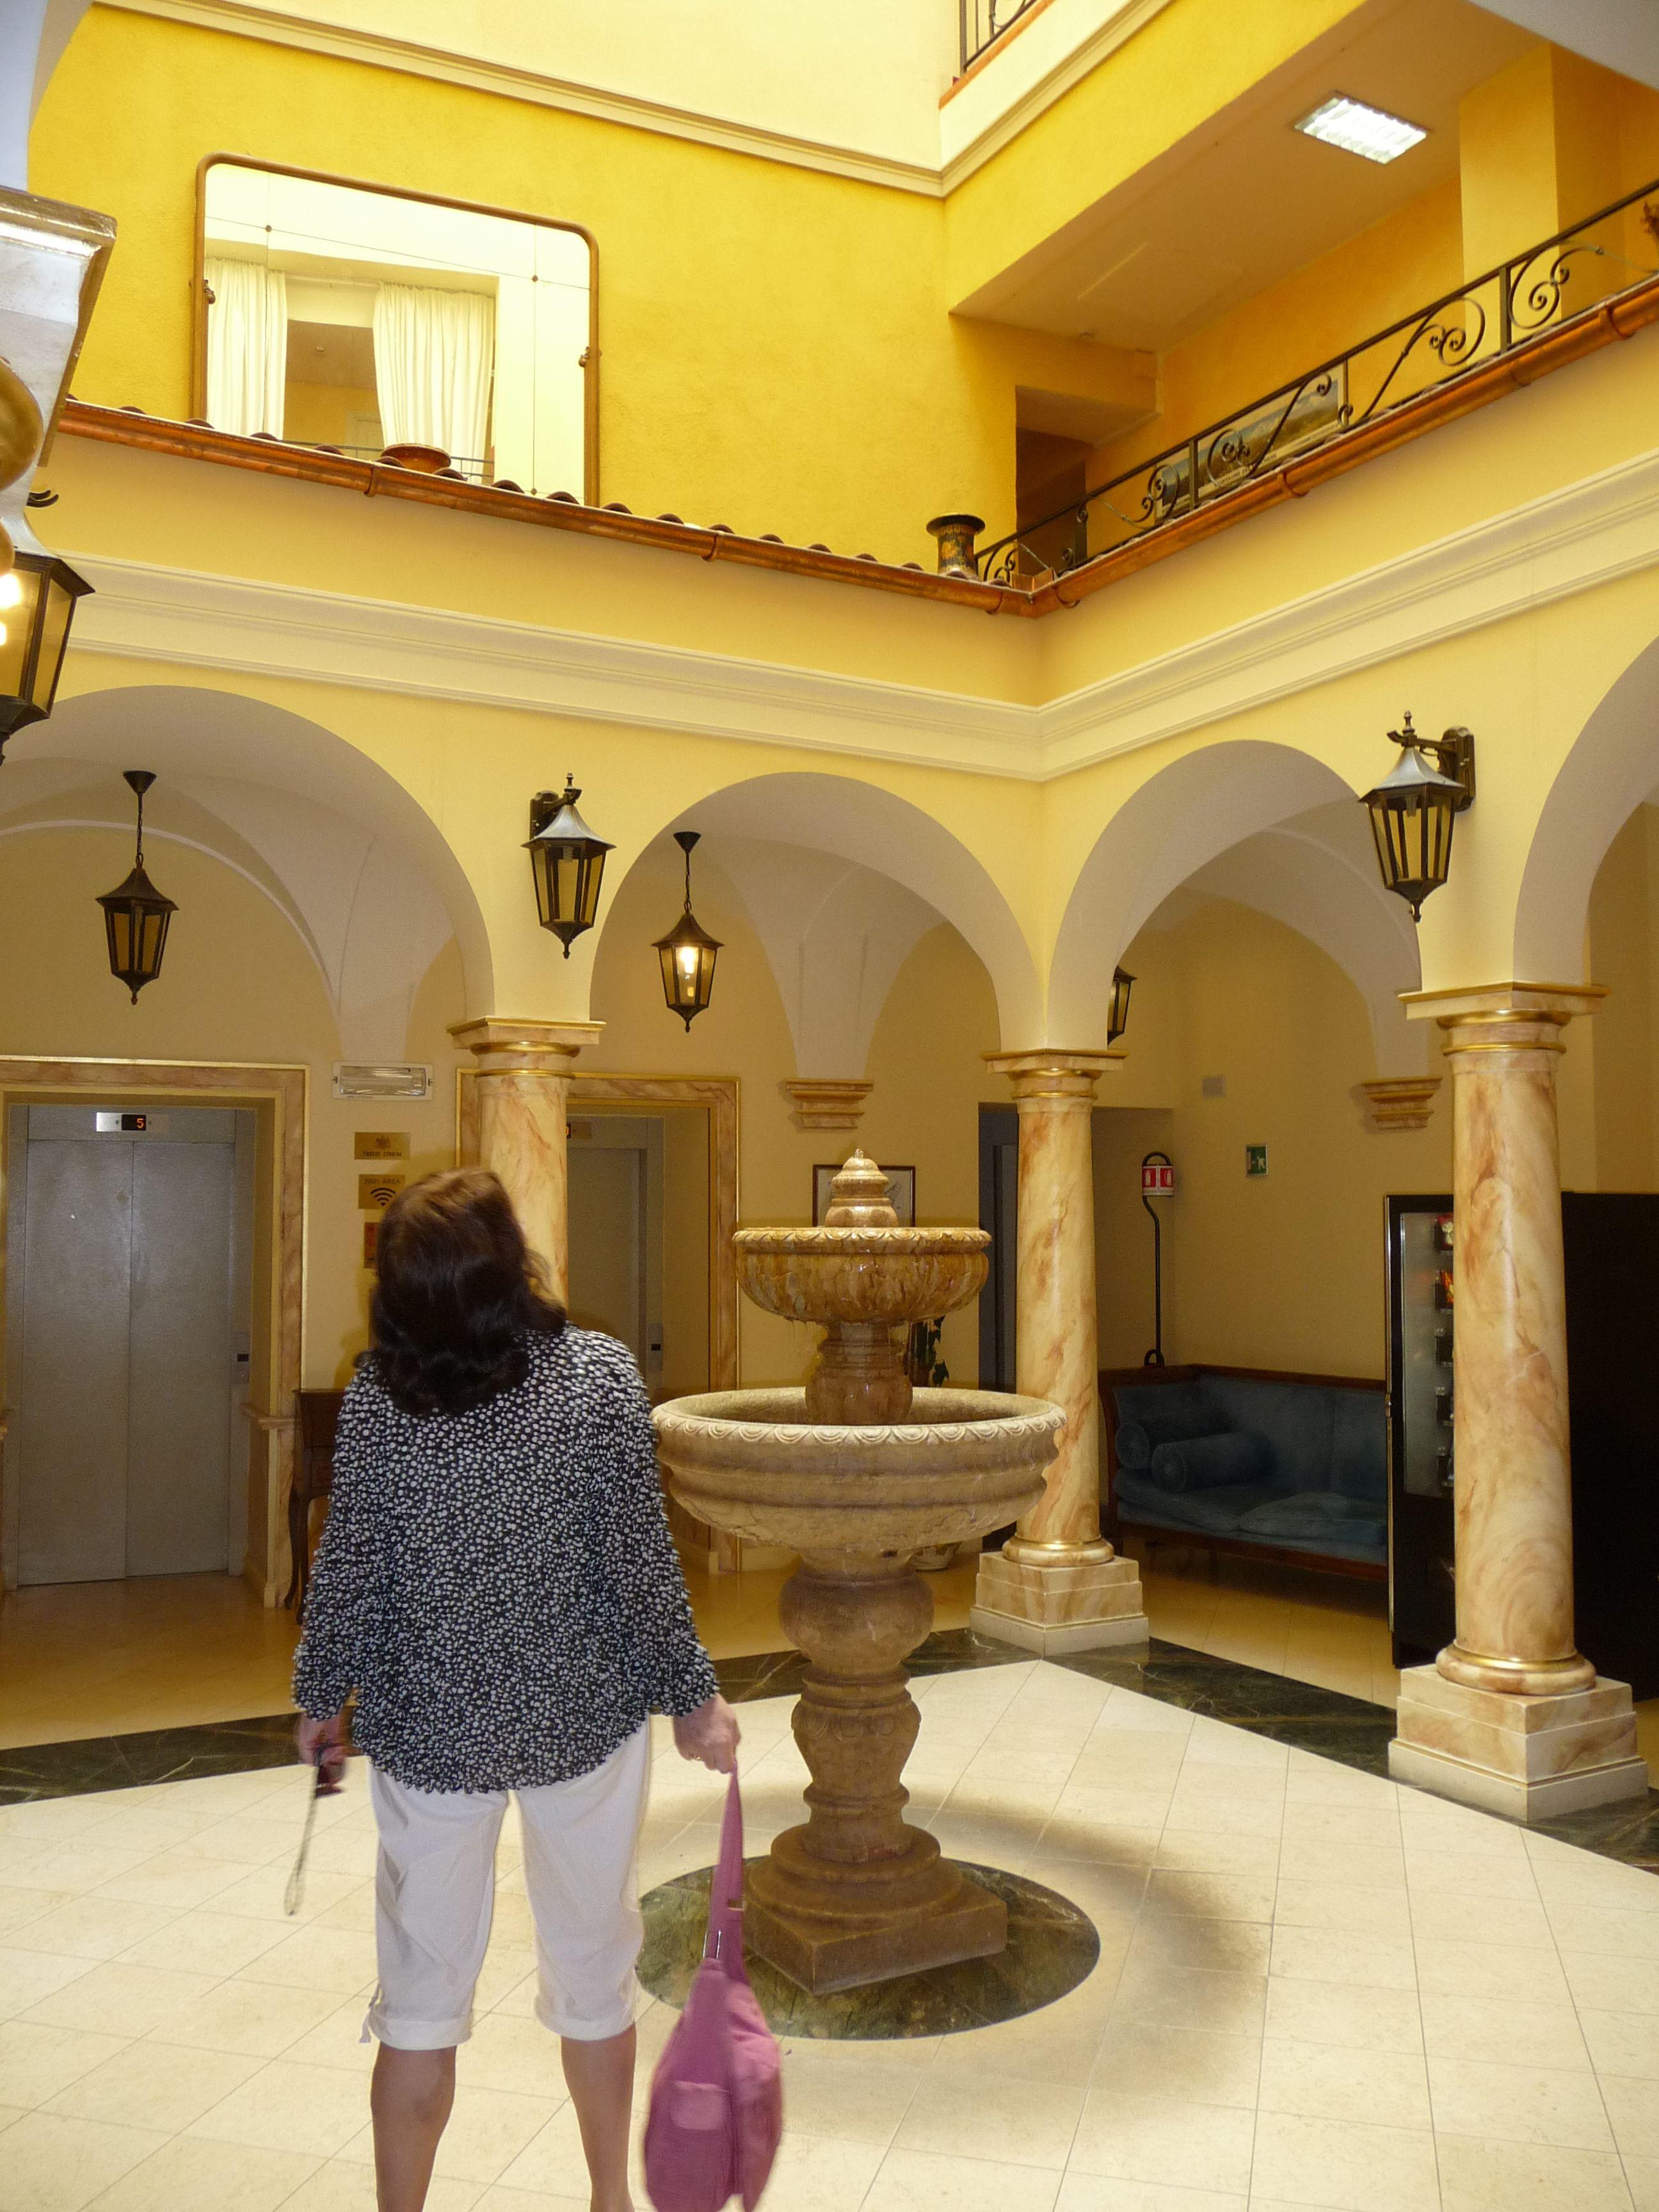 The Grand Britannia Excelsior hotel atrium. Lake Como, Italy.by B Waddington